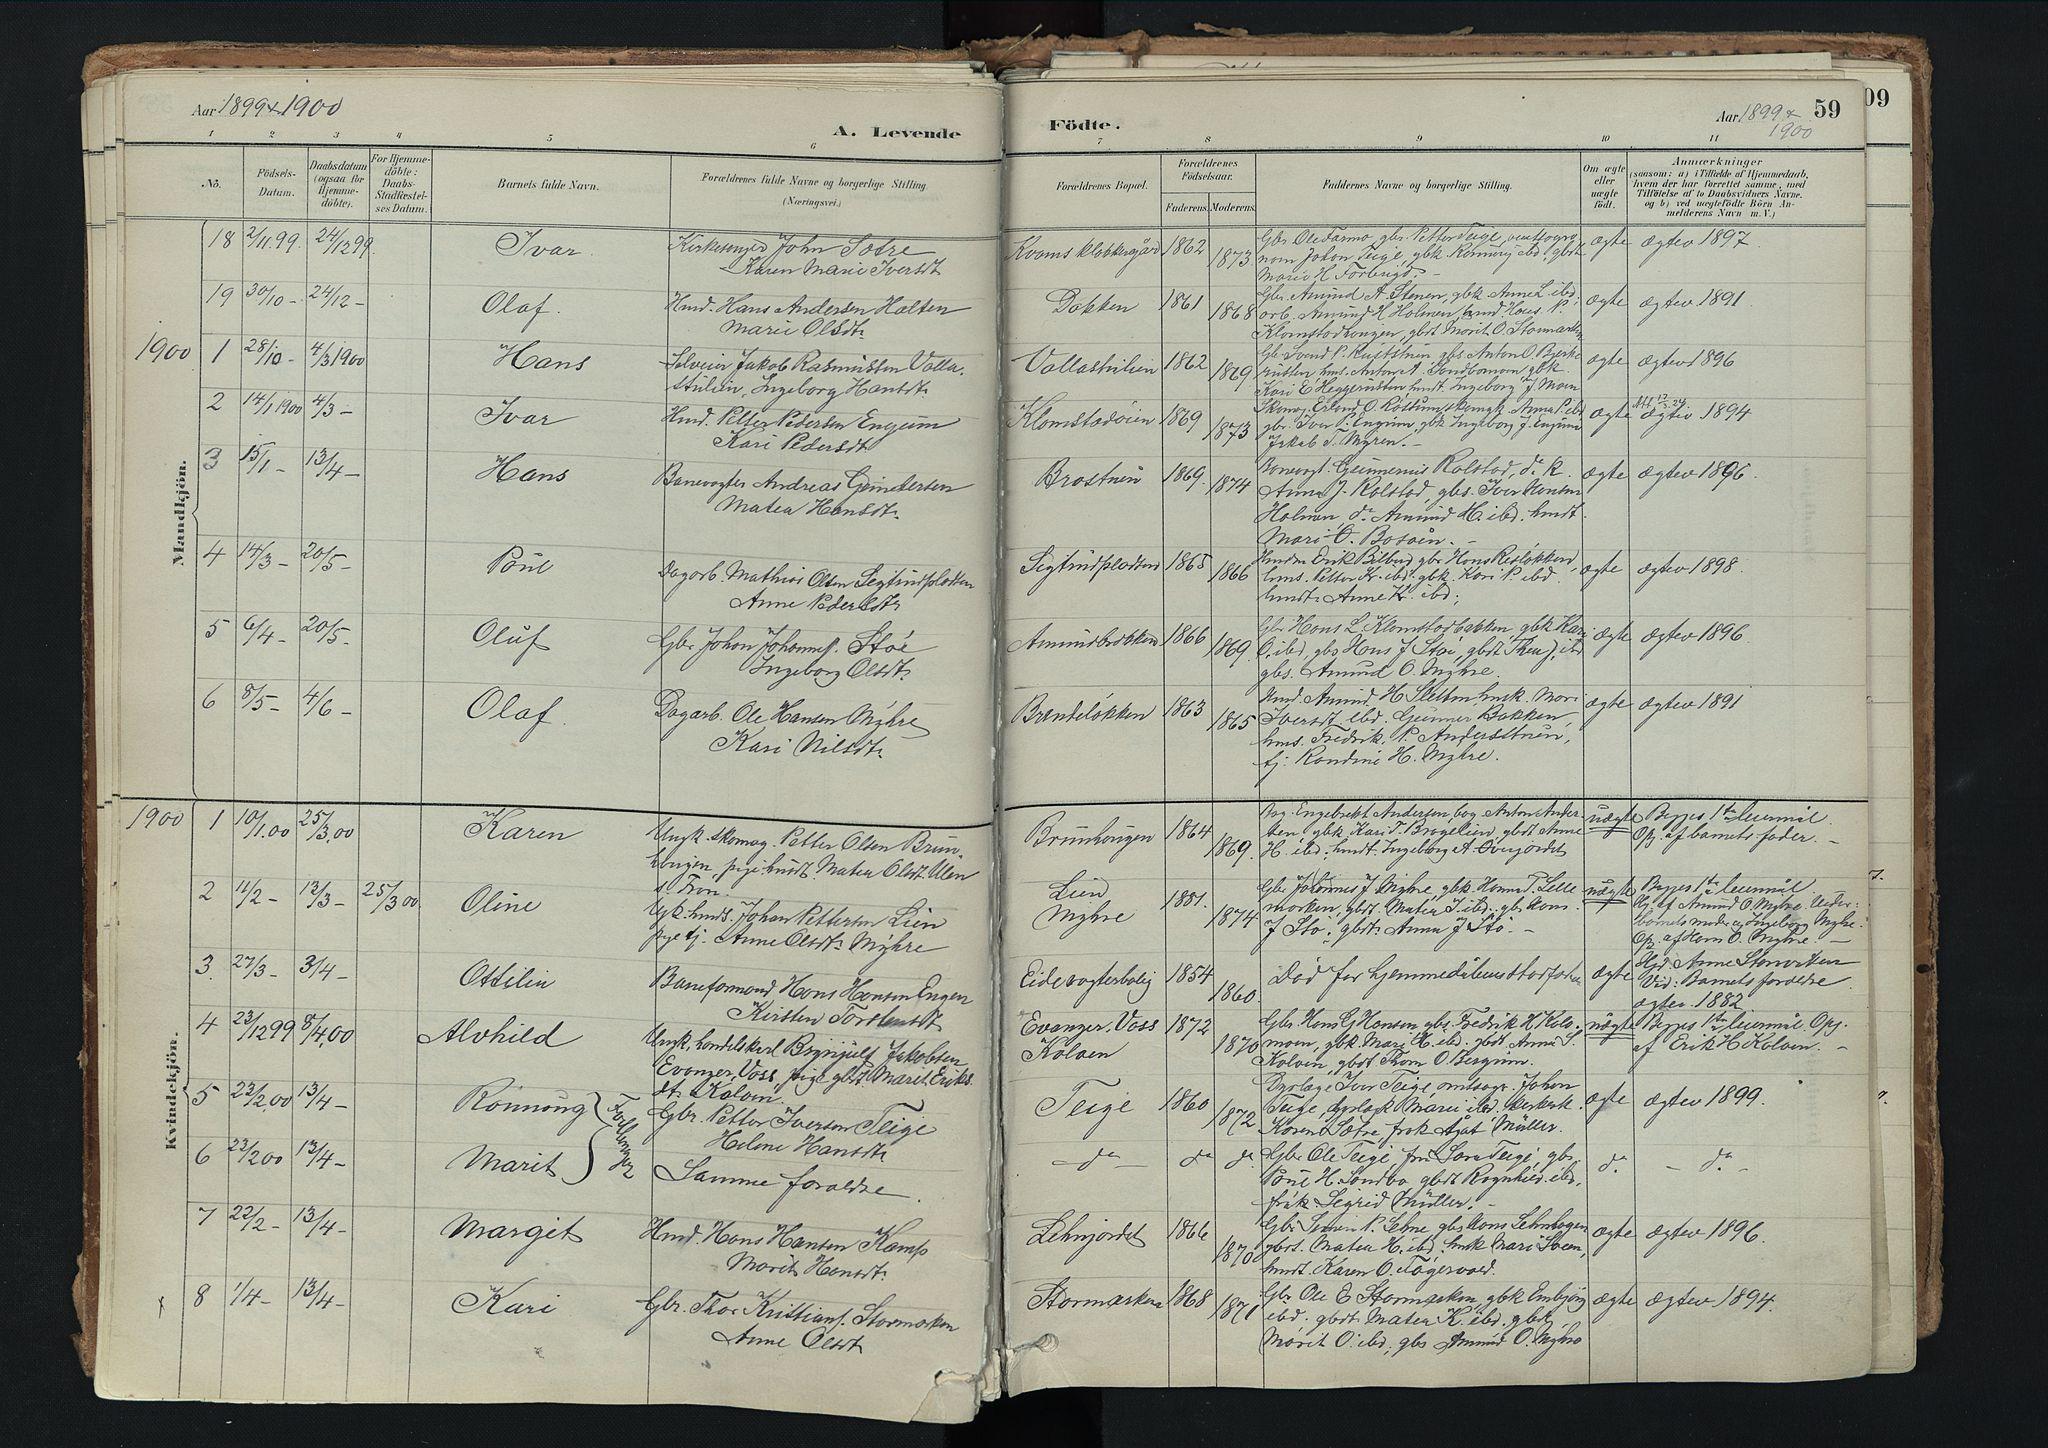 SAH, Nord-Fron prestekontor, Ministerialbok nr. 3, 1884-1914, s. 59